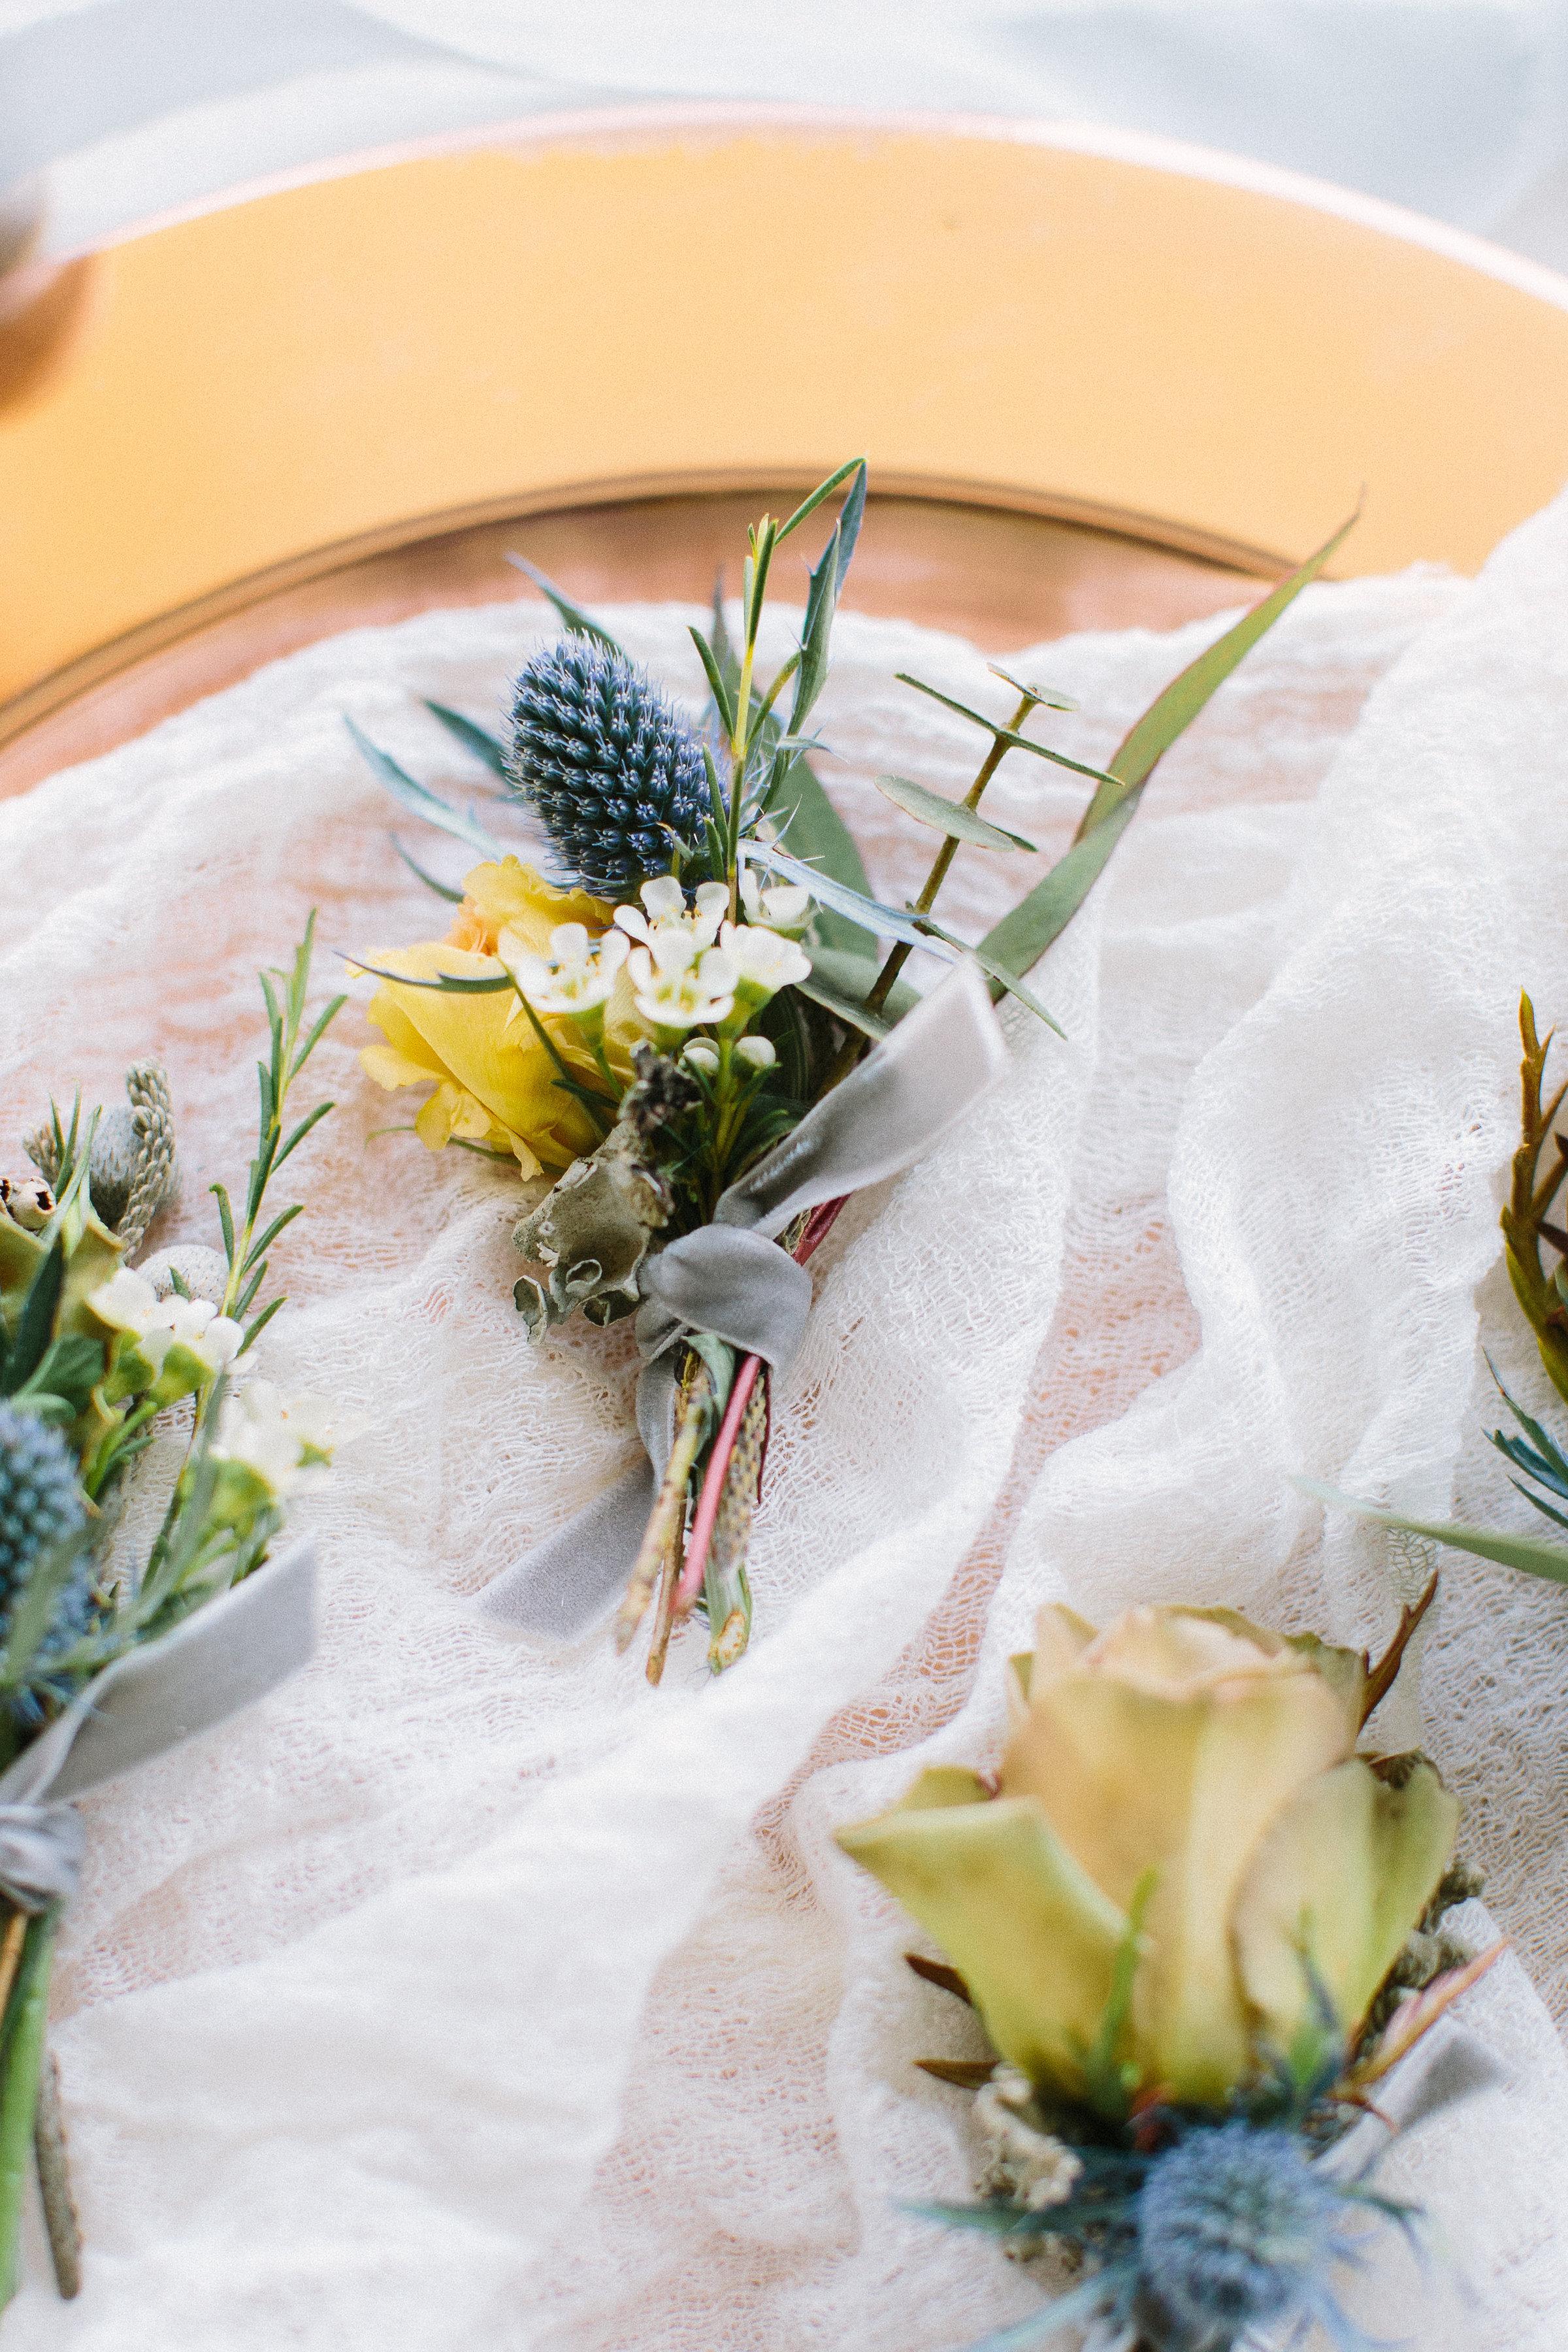 Ellen-Ashton-Photography-Peach-Creek-Ranch-Weddings-Wed-and-Prosper20